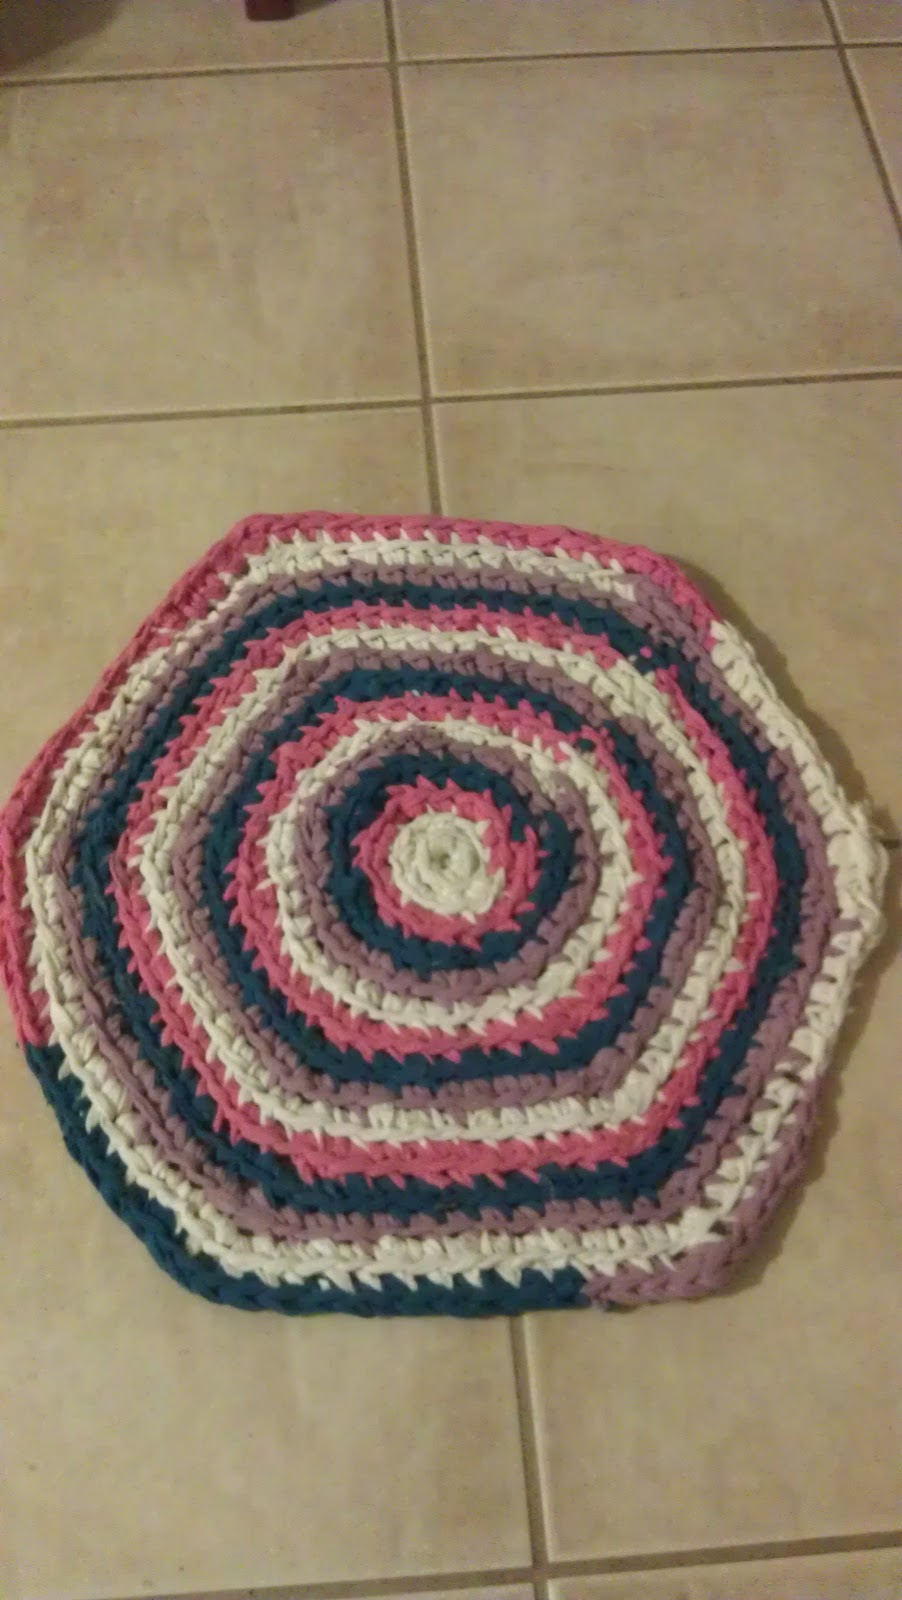 Crochet Blog- JellyBeanster: Crochet Recycled T-shirt yarn Rug